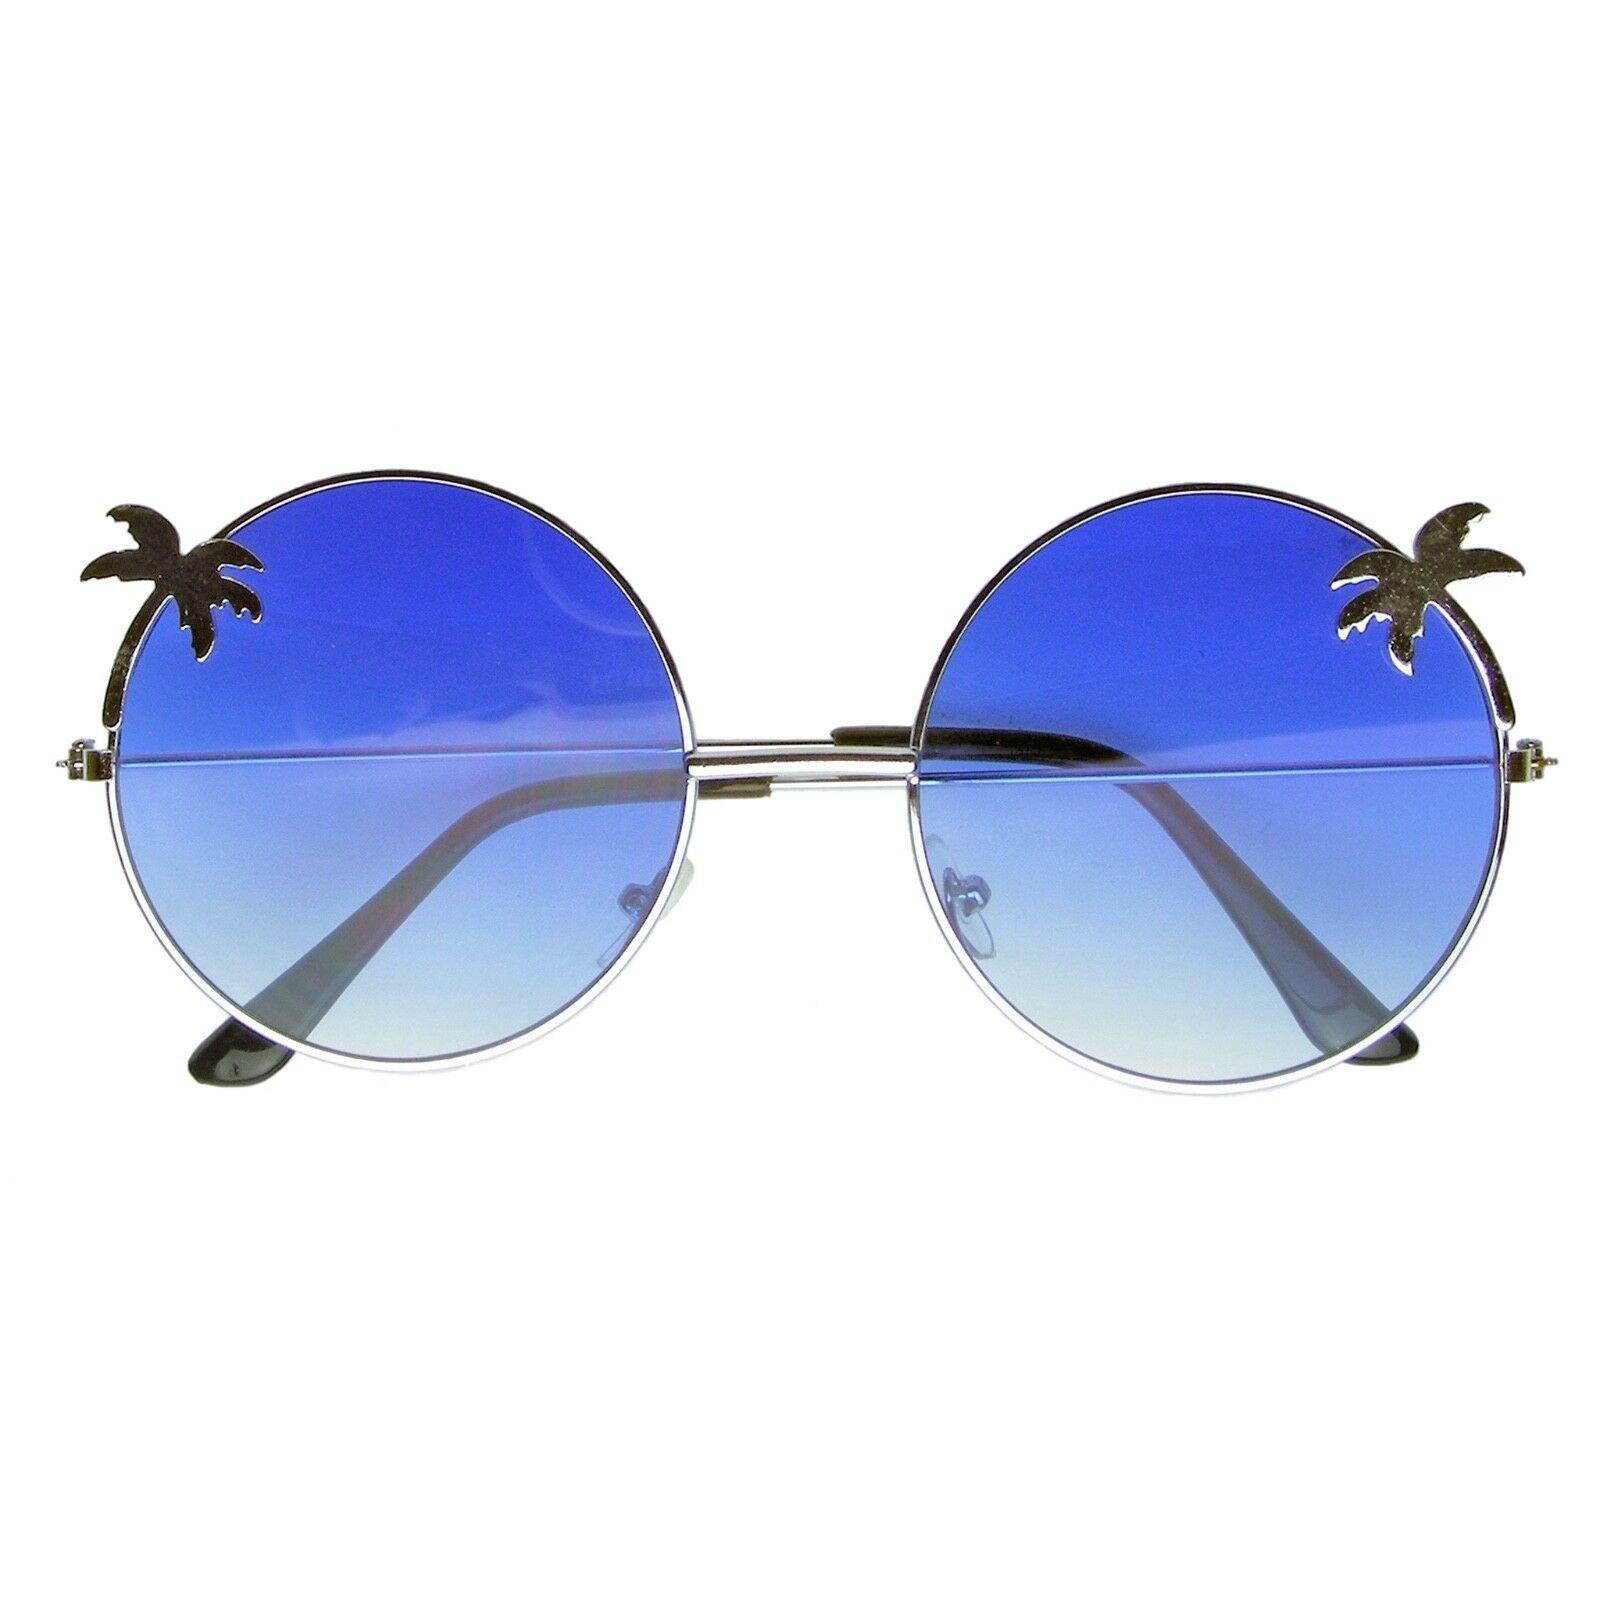 Vintage Retro Round Sun Glasses Hippie Boho Sunglasses image 4